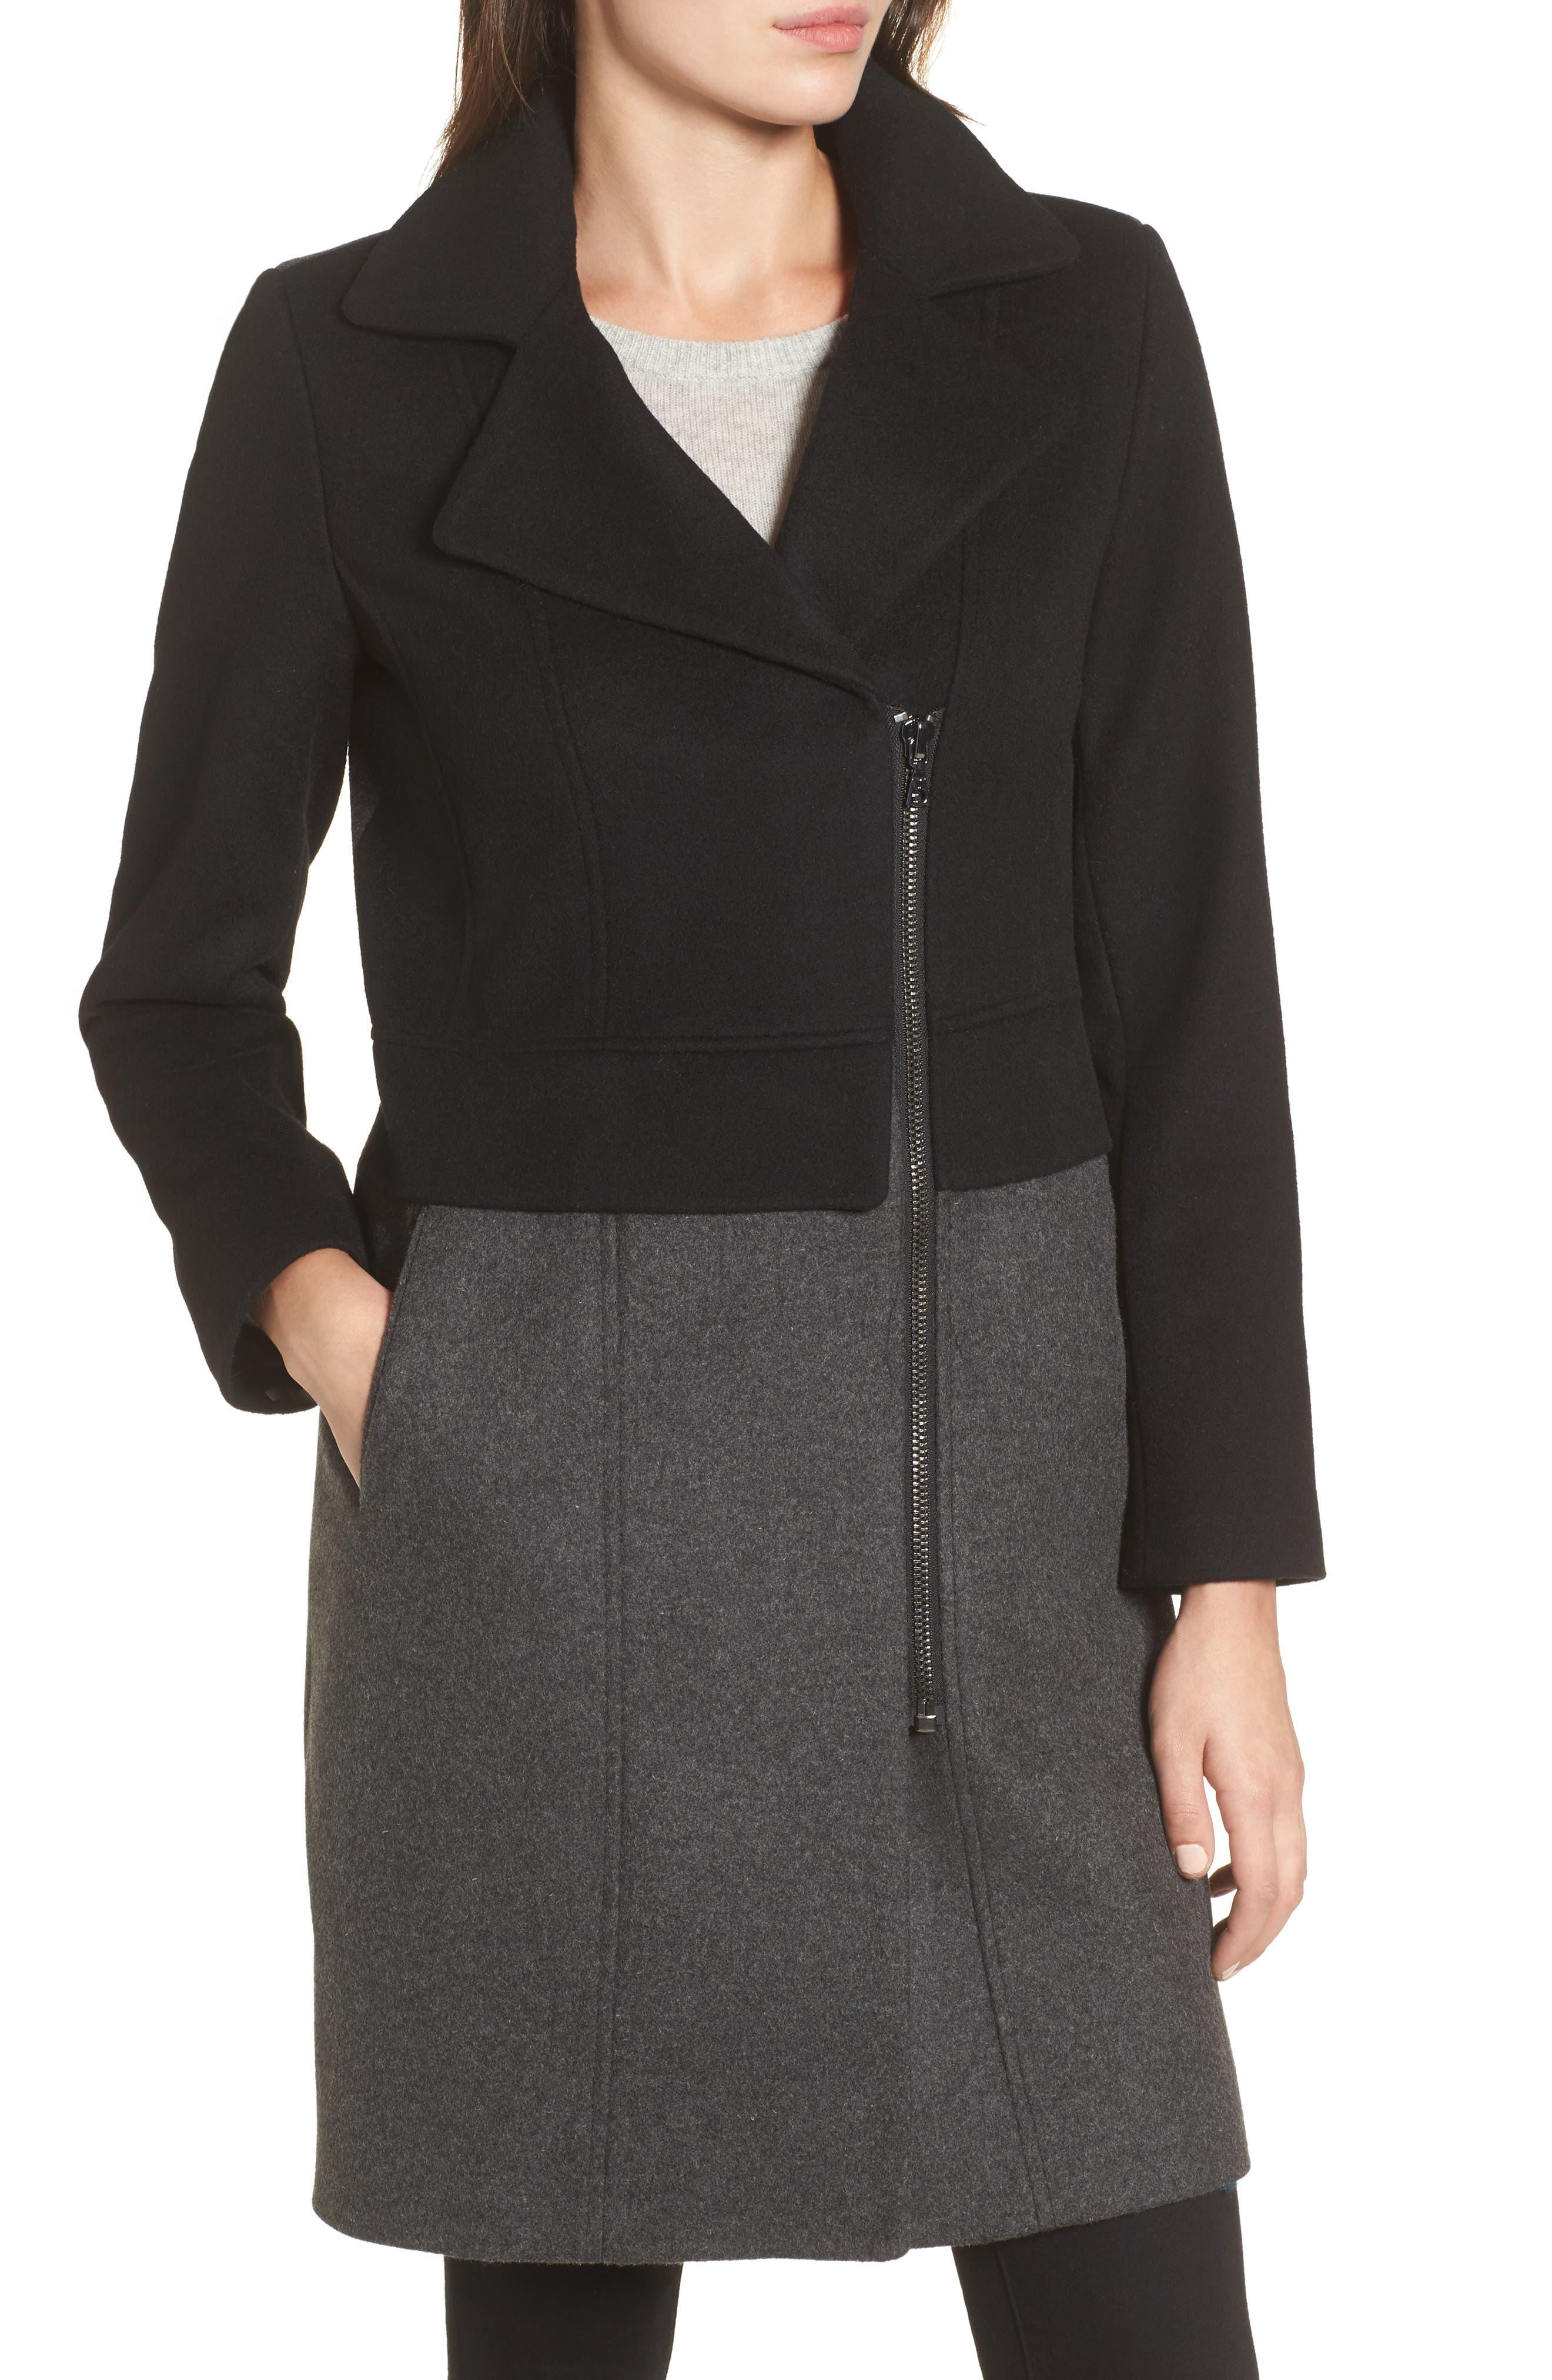 Brooklyn Colorblock Coat,                             Alternate thumbnail 3, color,                             Grey/ Black